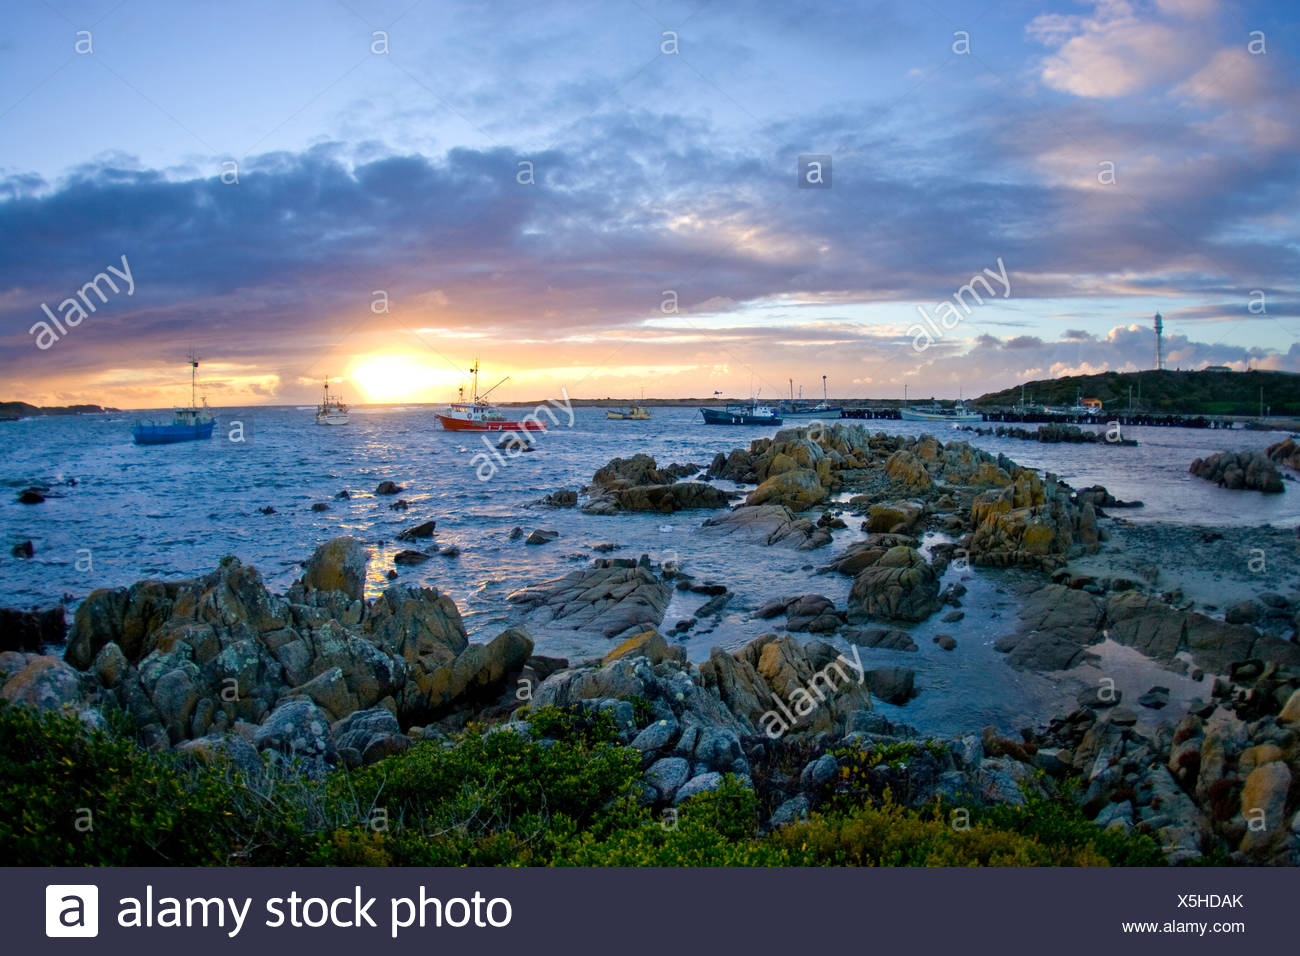 Sunset over fishing boats, King Island, Australia. - Stock Image